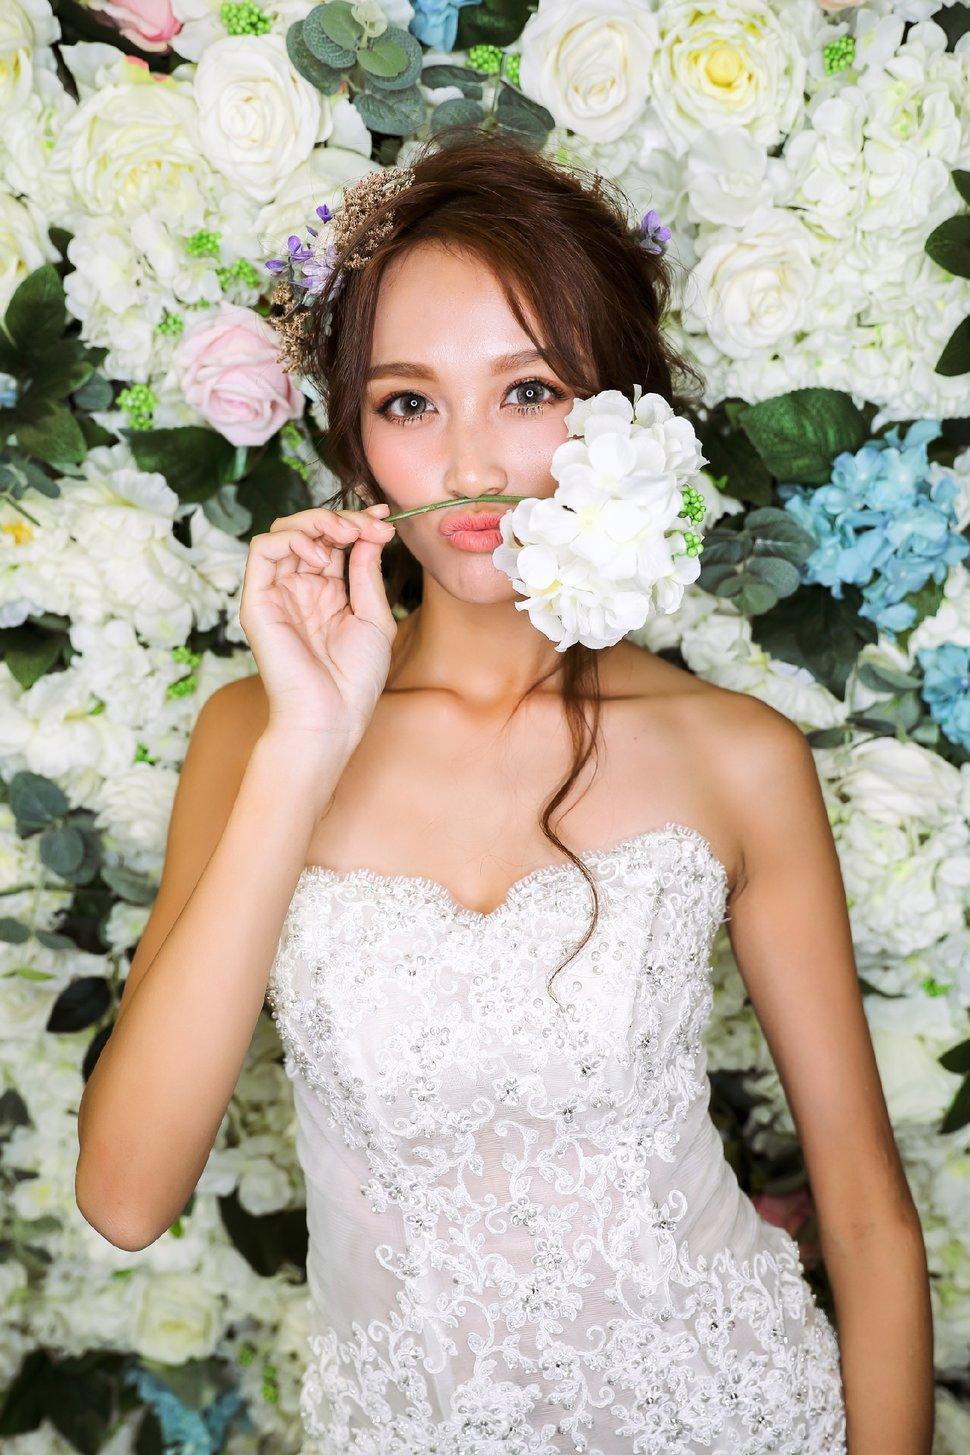 170A5216_mr1565851073563 - Elaine makeup《結婚吧》